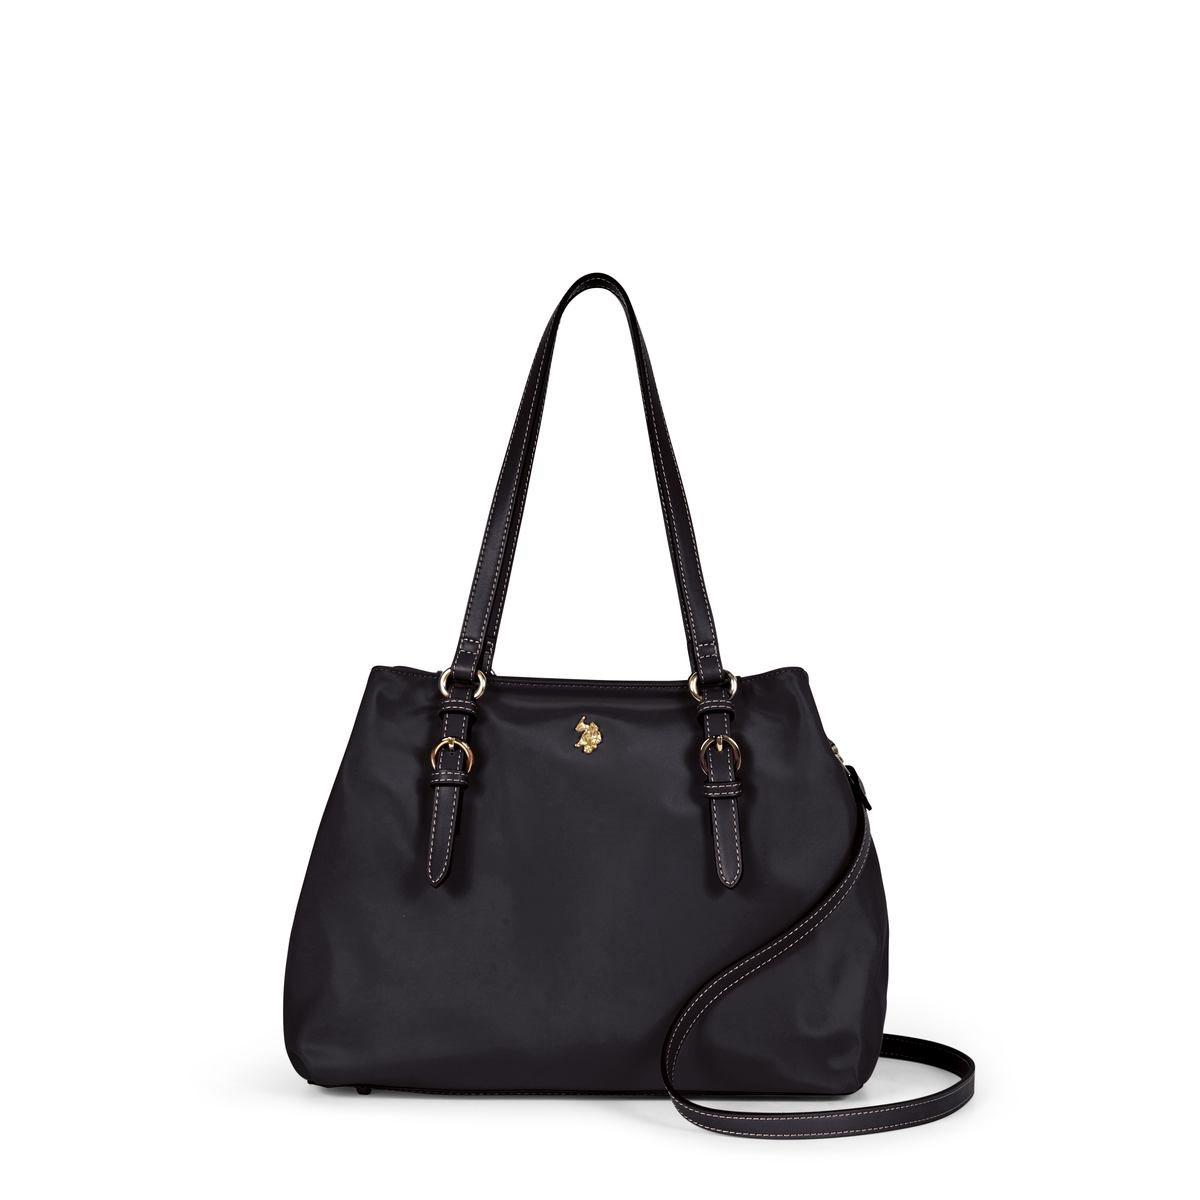 US Polo Assn. Τσάντα χειρός γυναικεία 33x14x24cm Houston Black